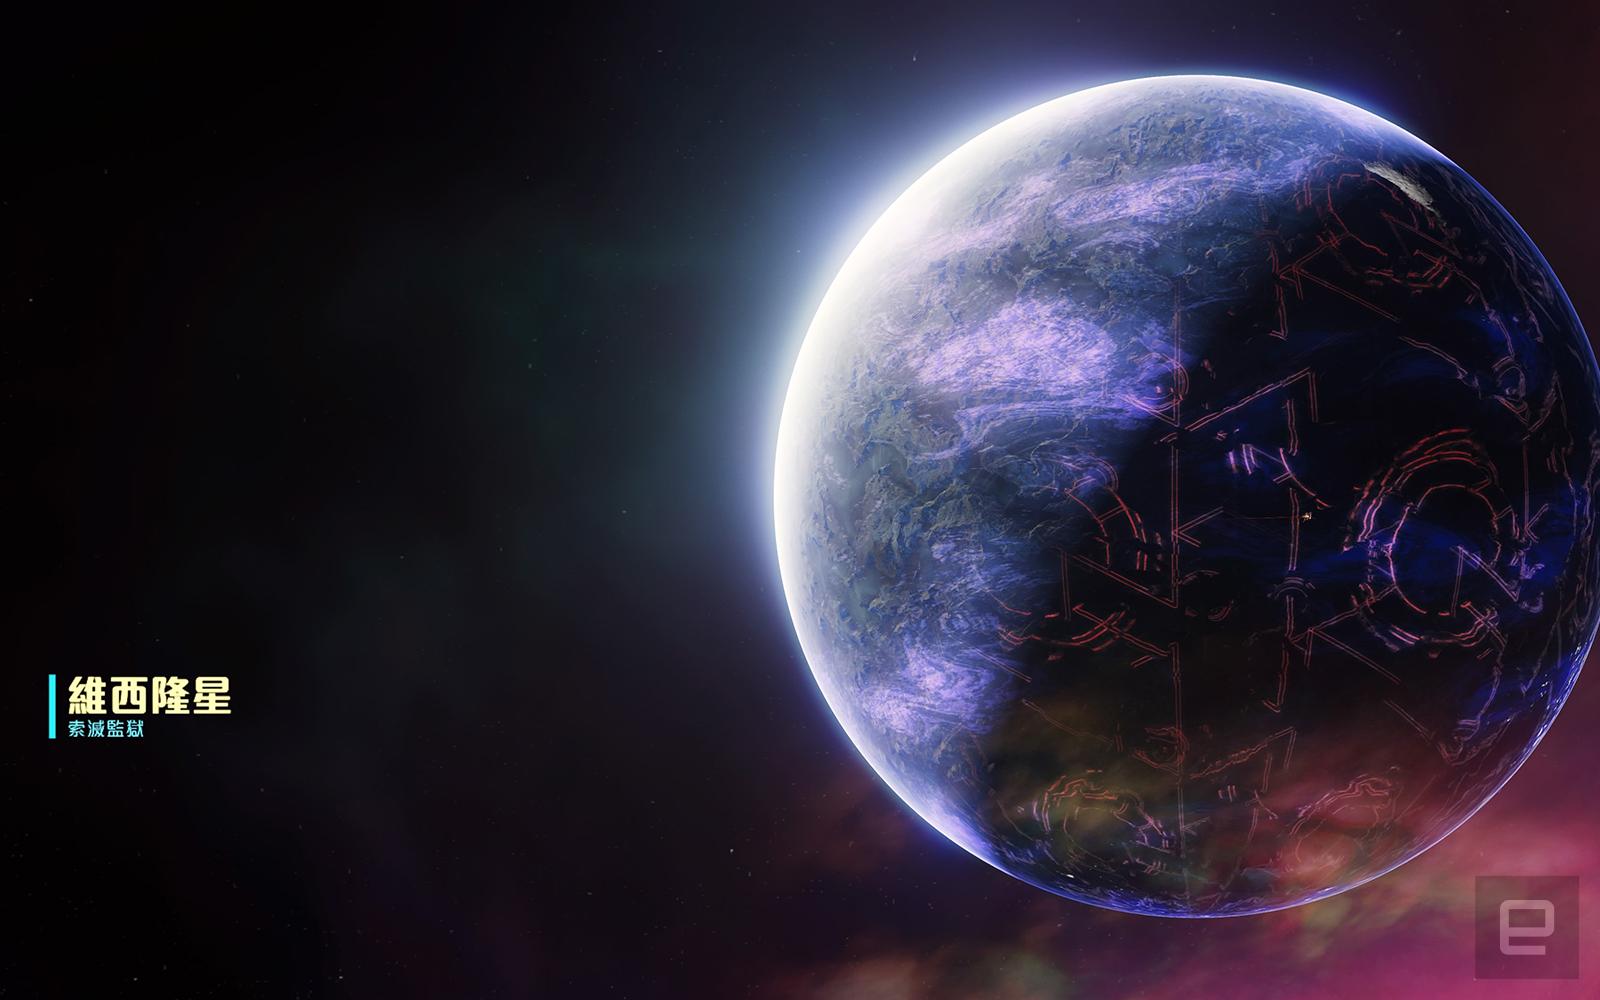 Ratchet & Clank Rift Apart Planet 9